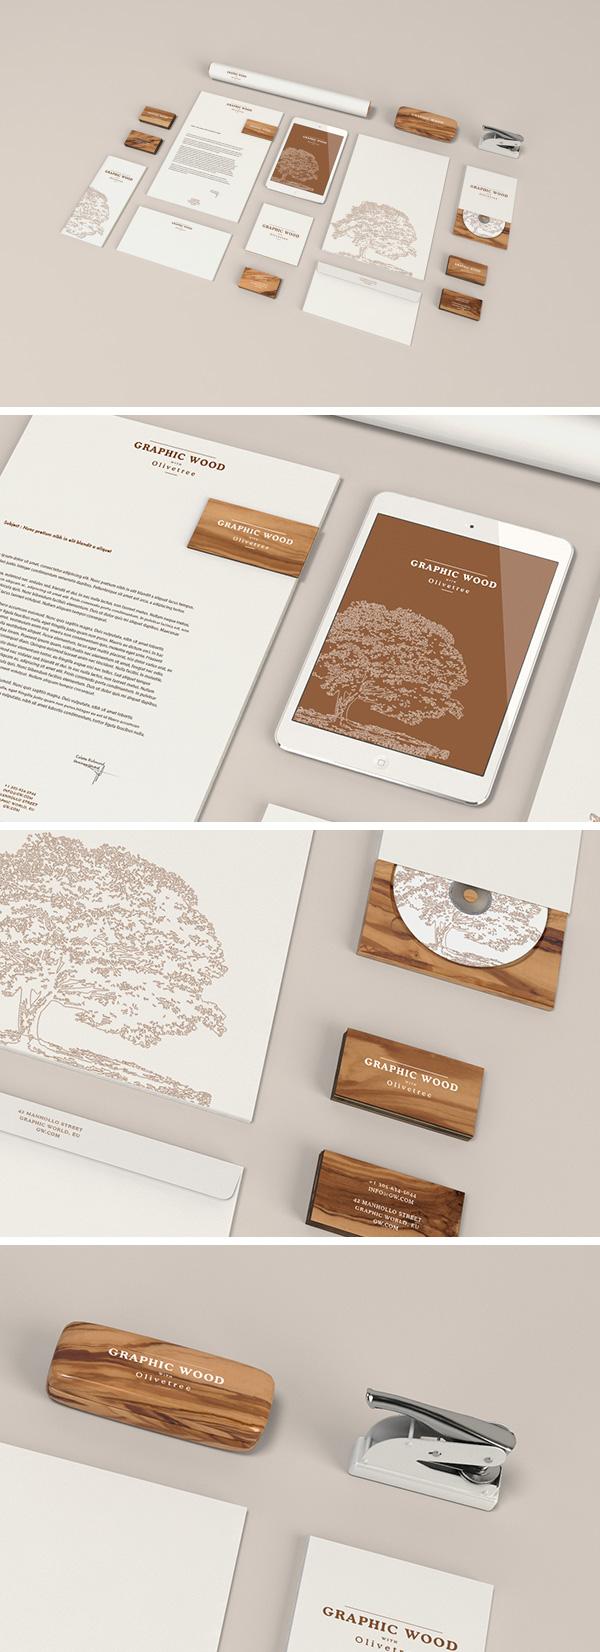 Free Stationery MockUp – Wood Edition